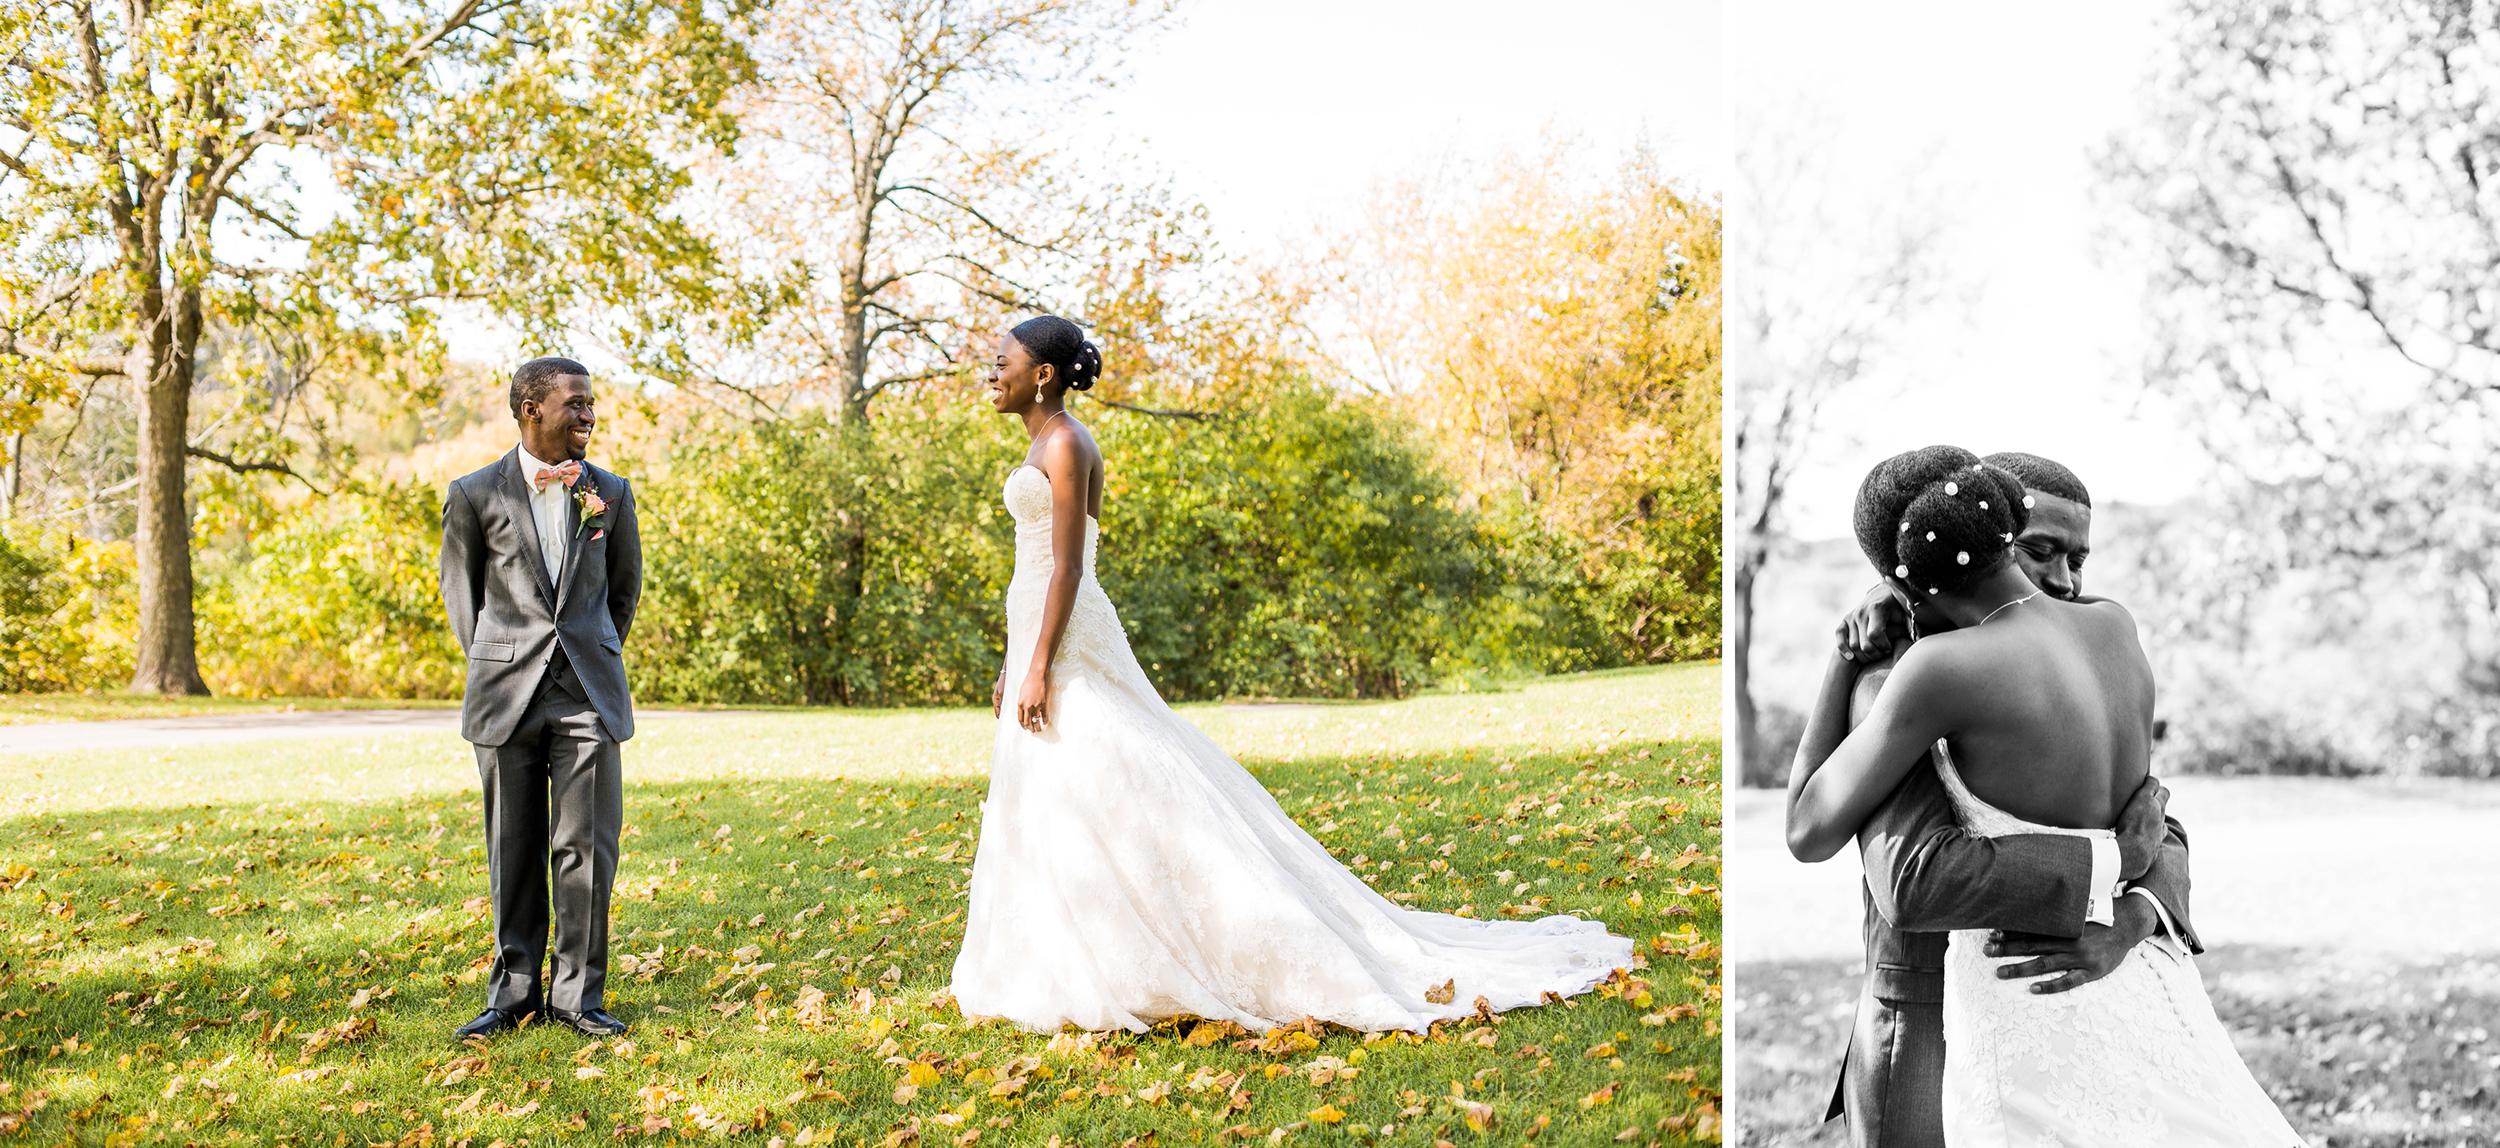 wedding photography mn minneapolis mpls 2.jpg